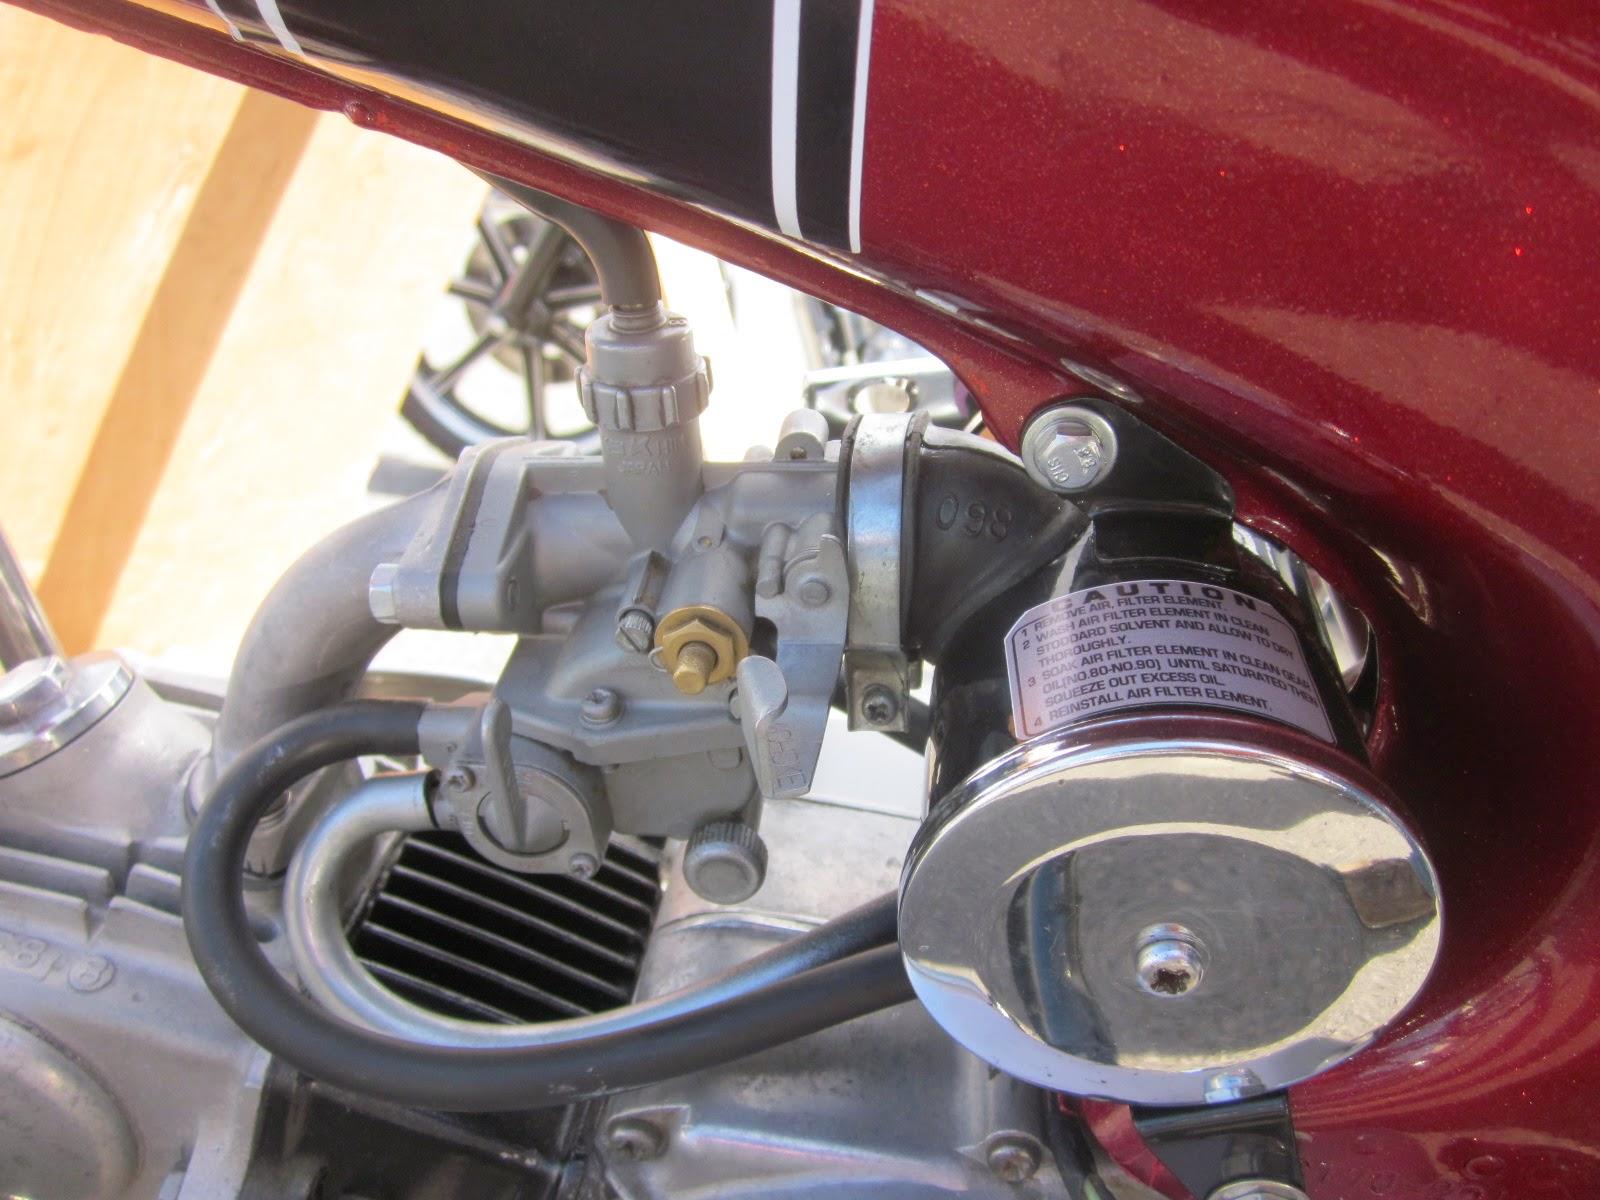 Oldmotodude 1972 Honda Ct70 On Display At The 2014 Retro Riders 1970 Engine Vintage Motorcycle Show Pasco Wa